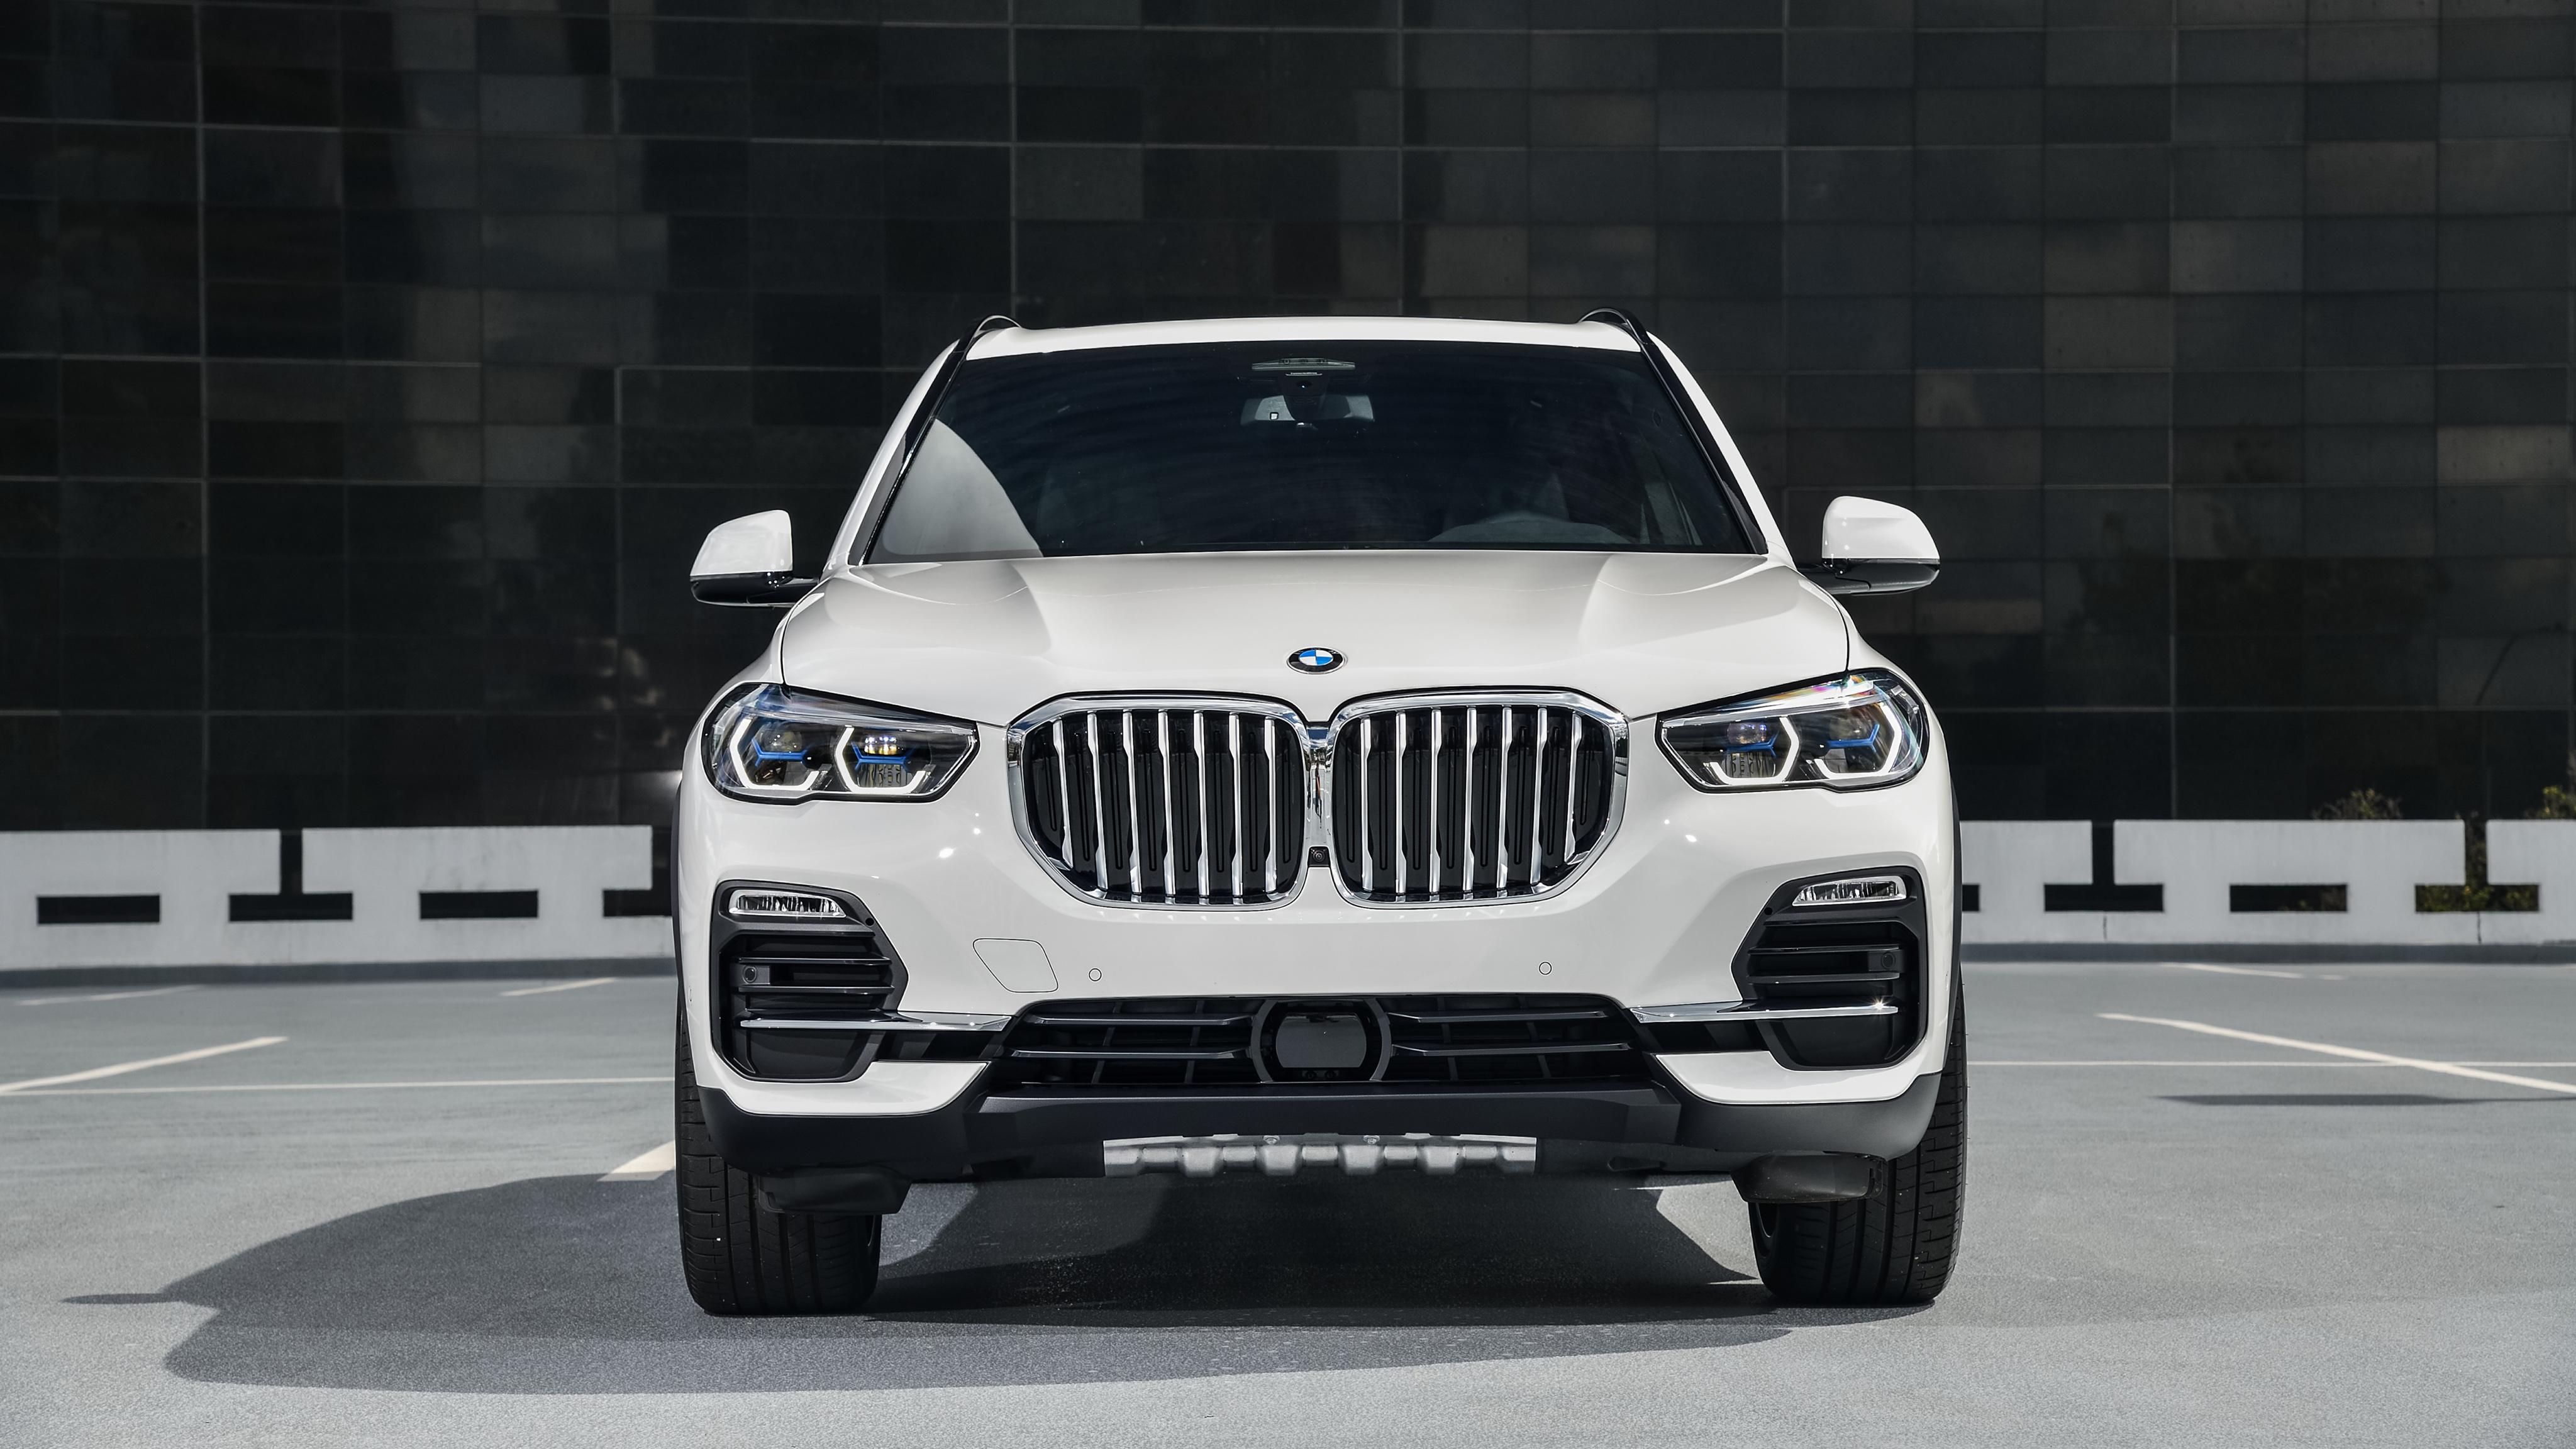 BMW X5 xDrive30d 2018 4K Wallpaper | HD Car Wallpapers ...